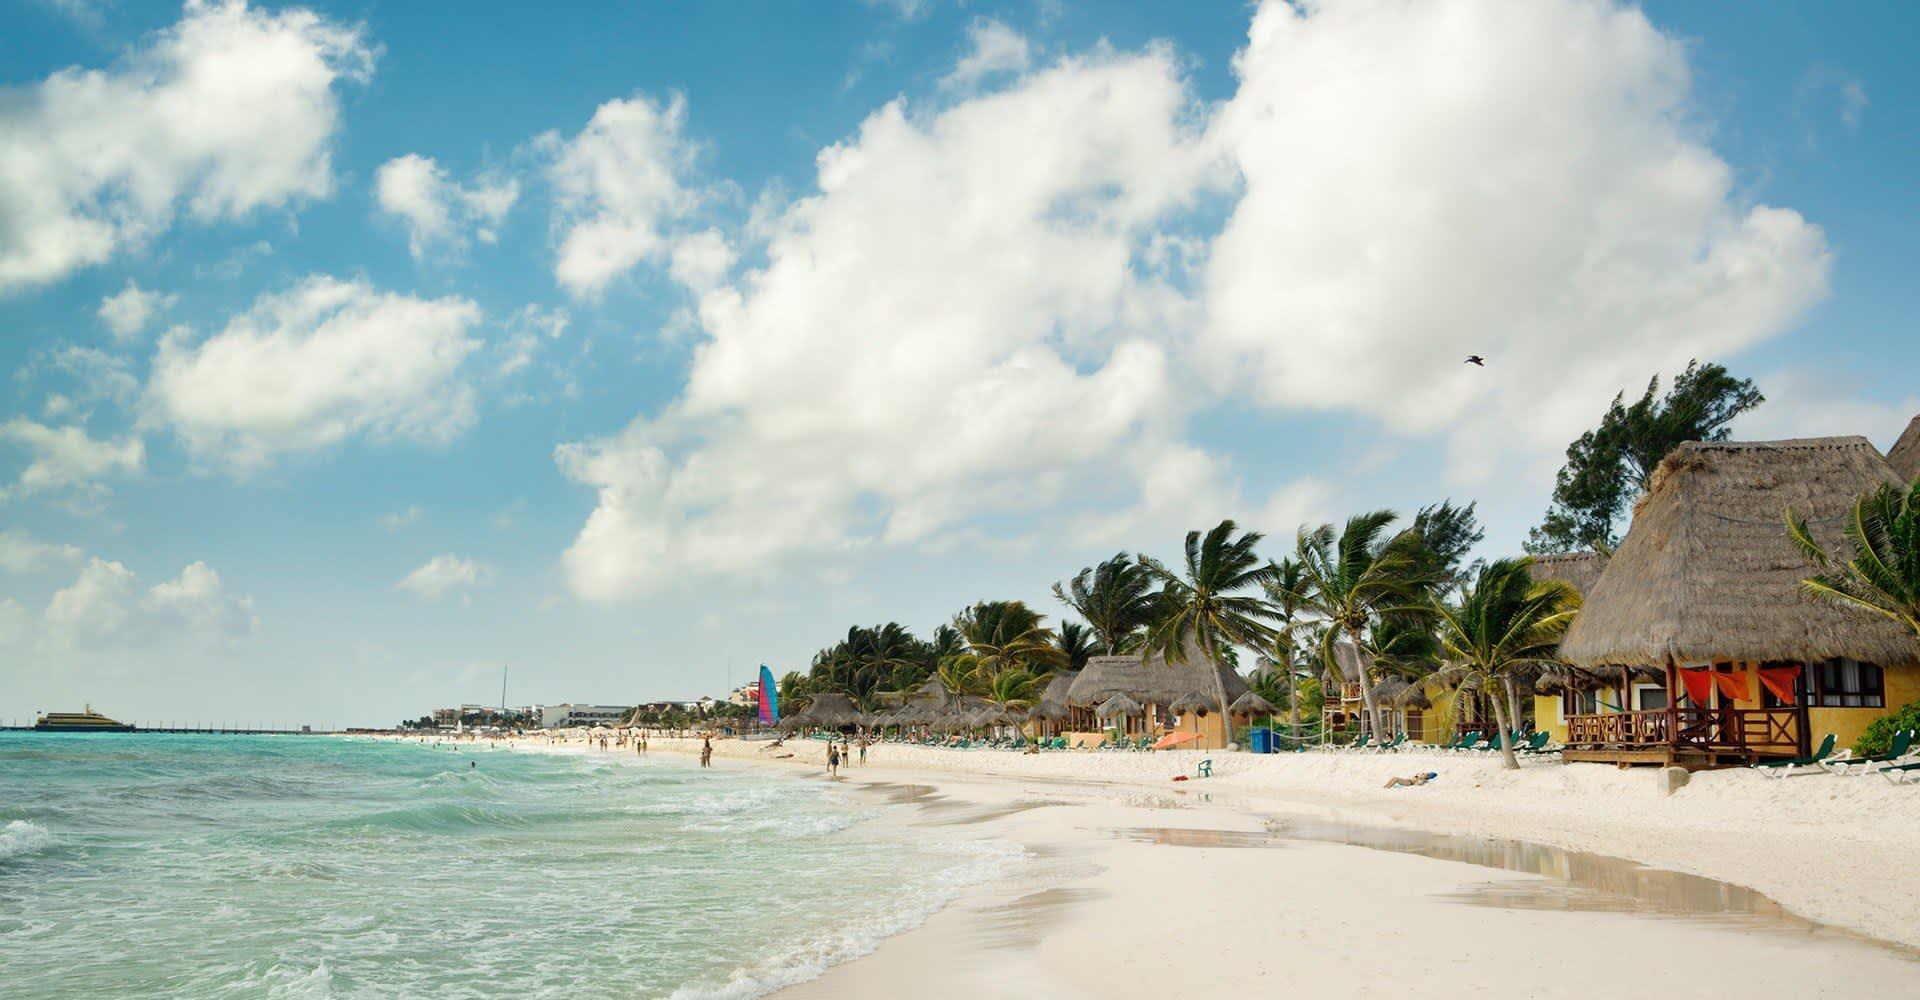 Playa del Carmen Hotels, Mexico